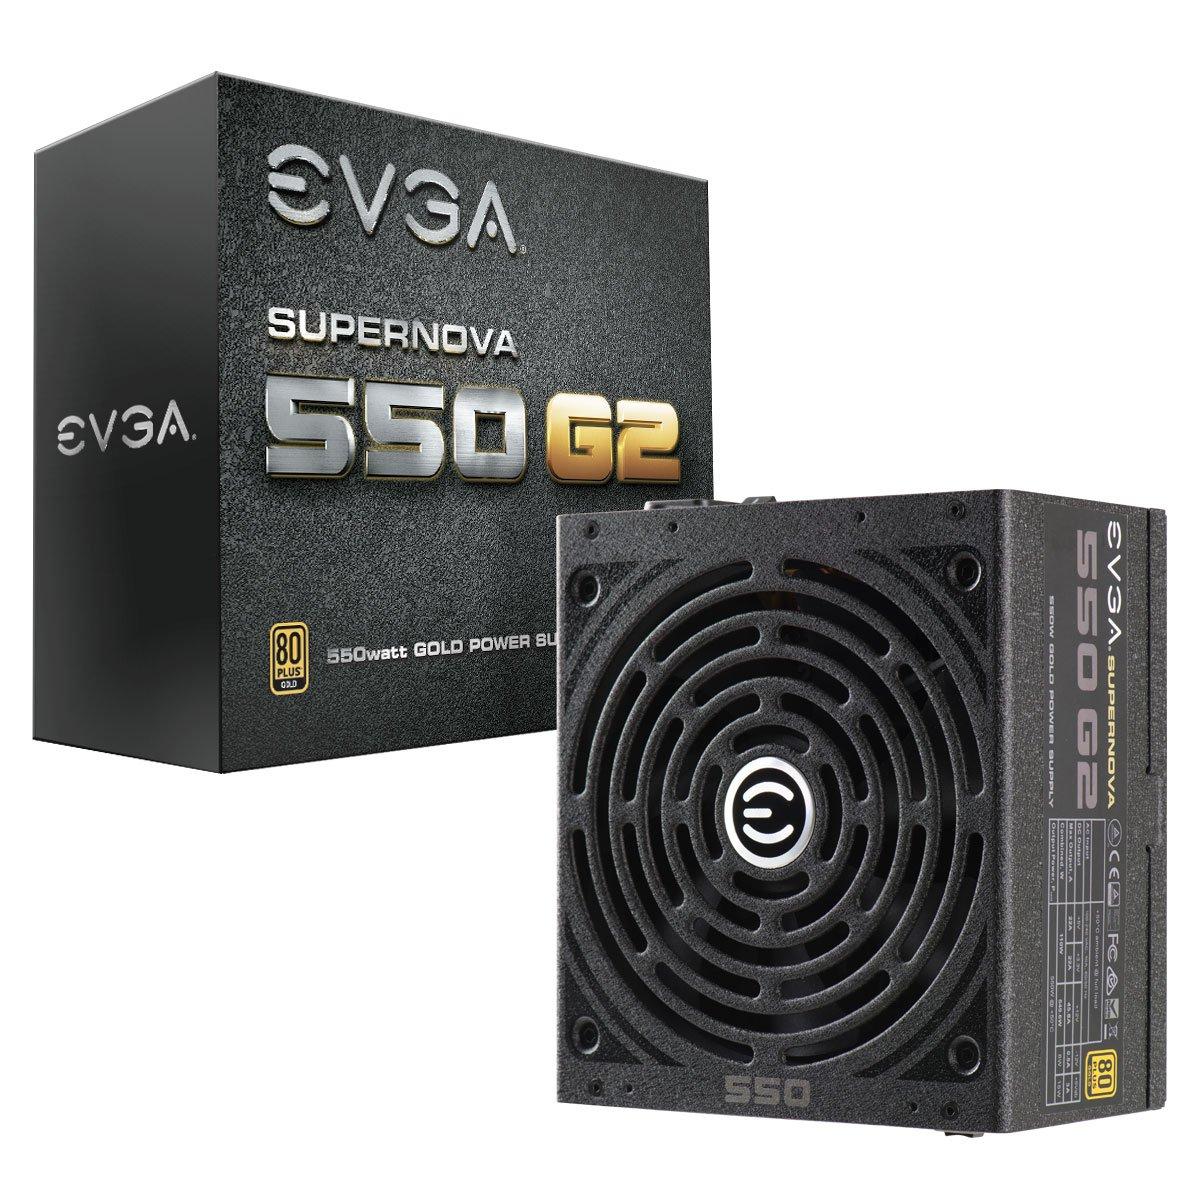 EVGA SuperNOVA 550 G2, 80+ GOLD 550W, Fully Modular PSU £68.99 at Amazon